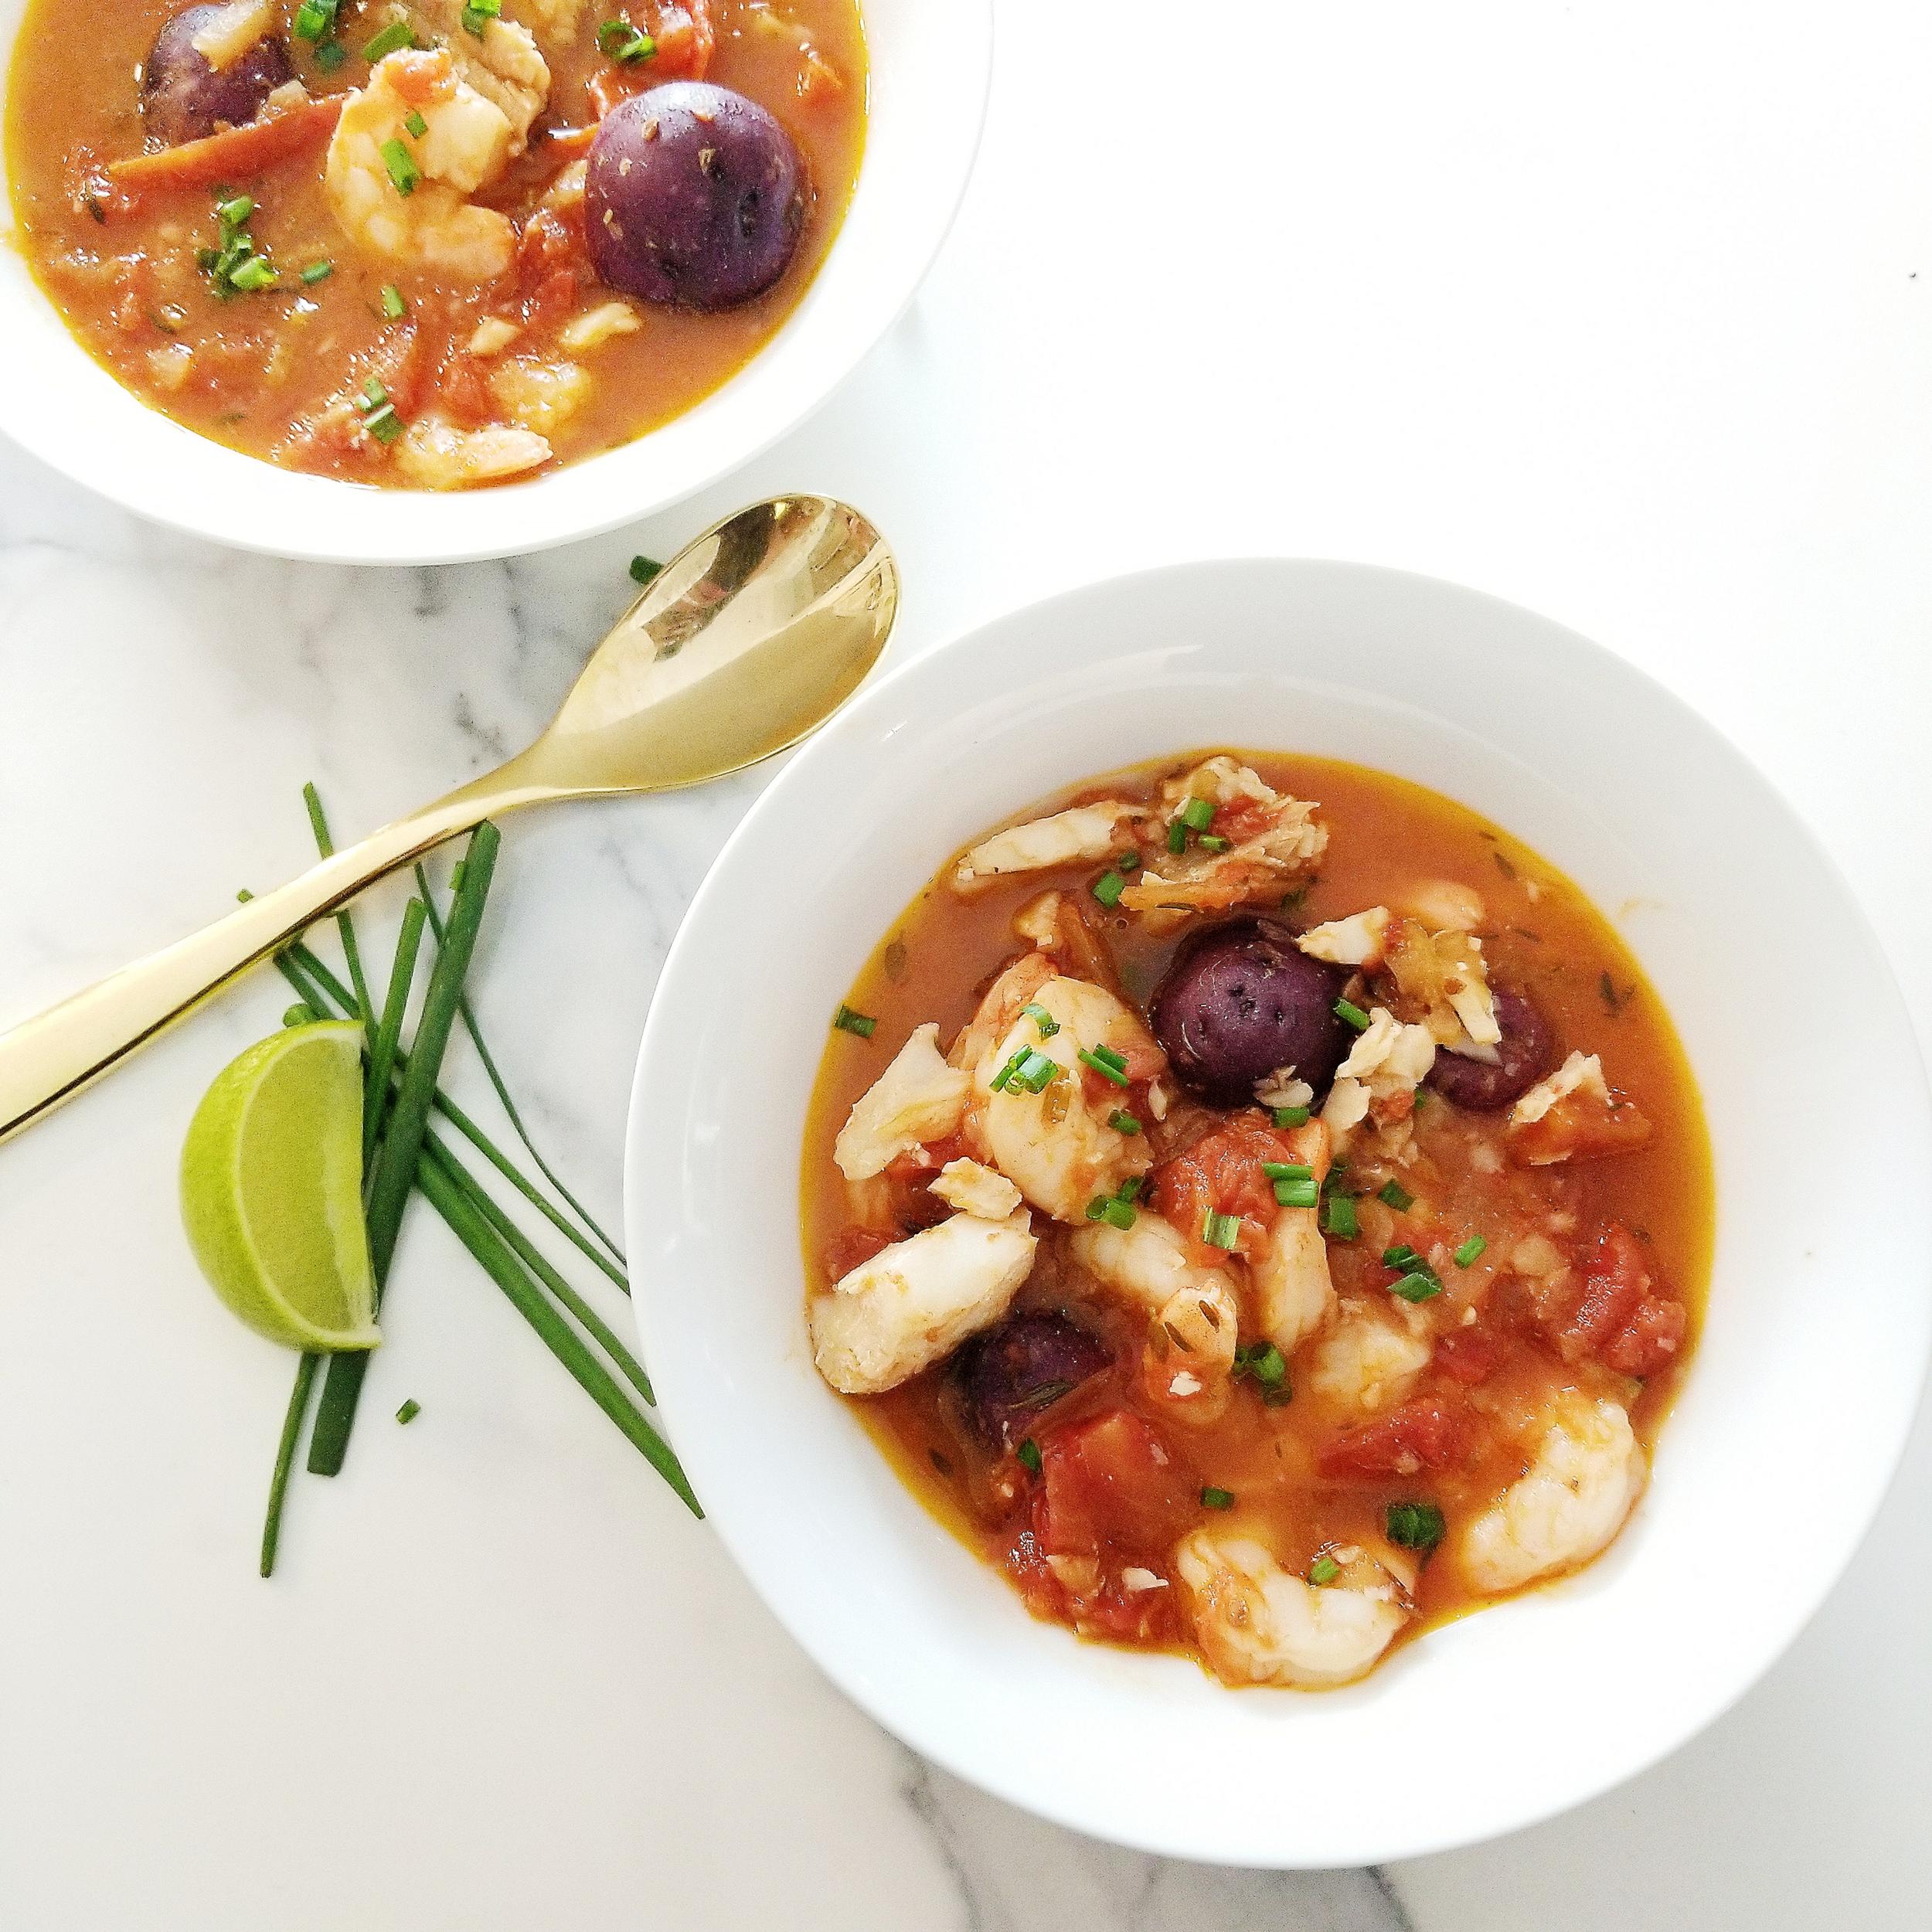 Shrimp & Cod Stew